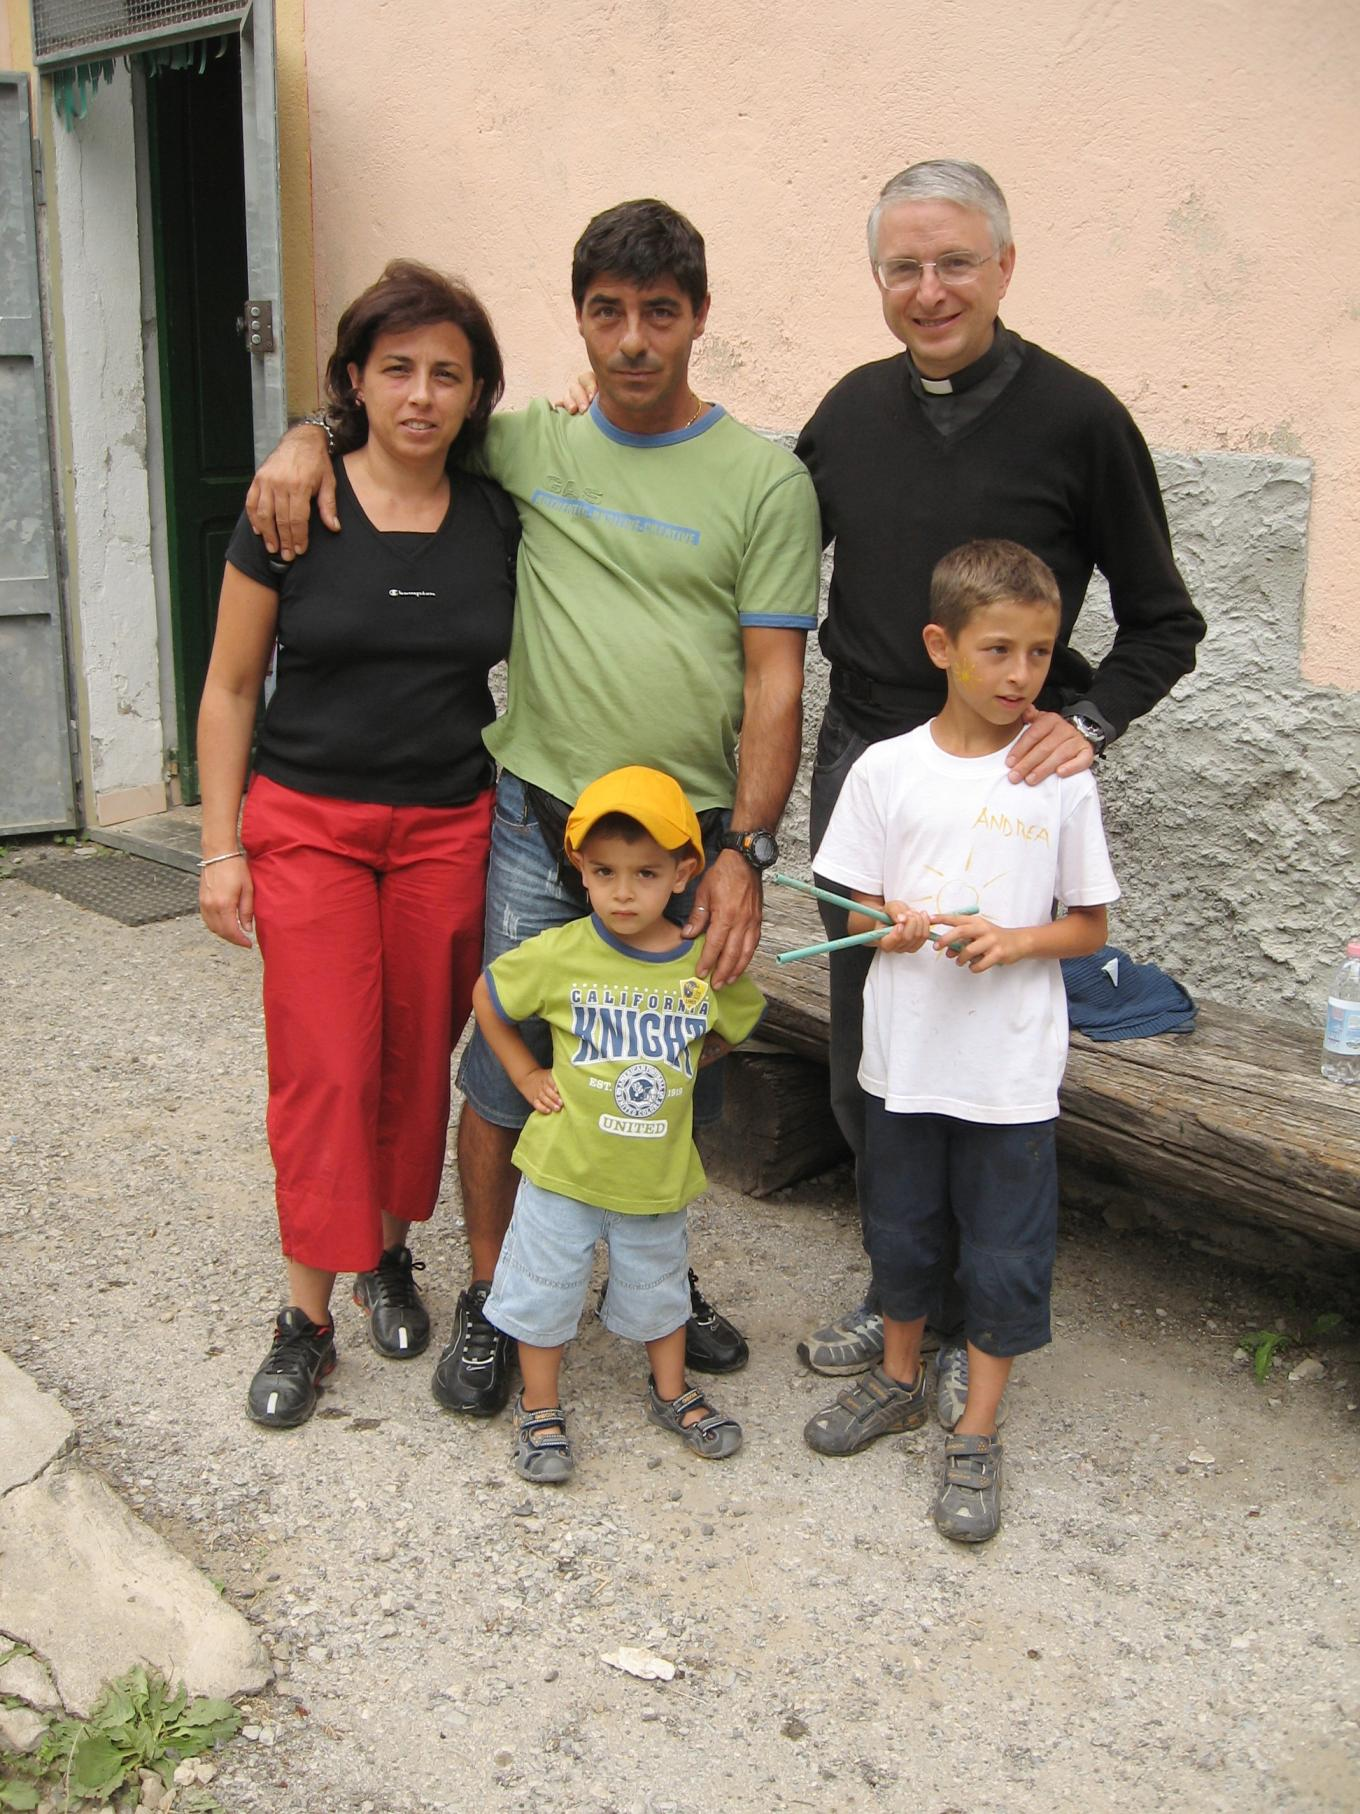 Campo_San_Giacomo_famiglie-2009-07-12--14.40.52